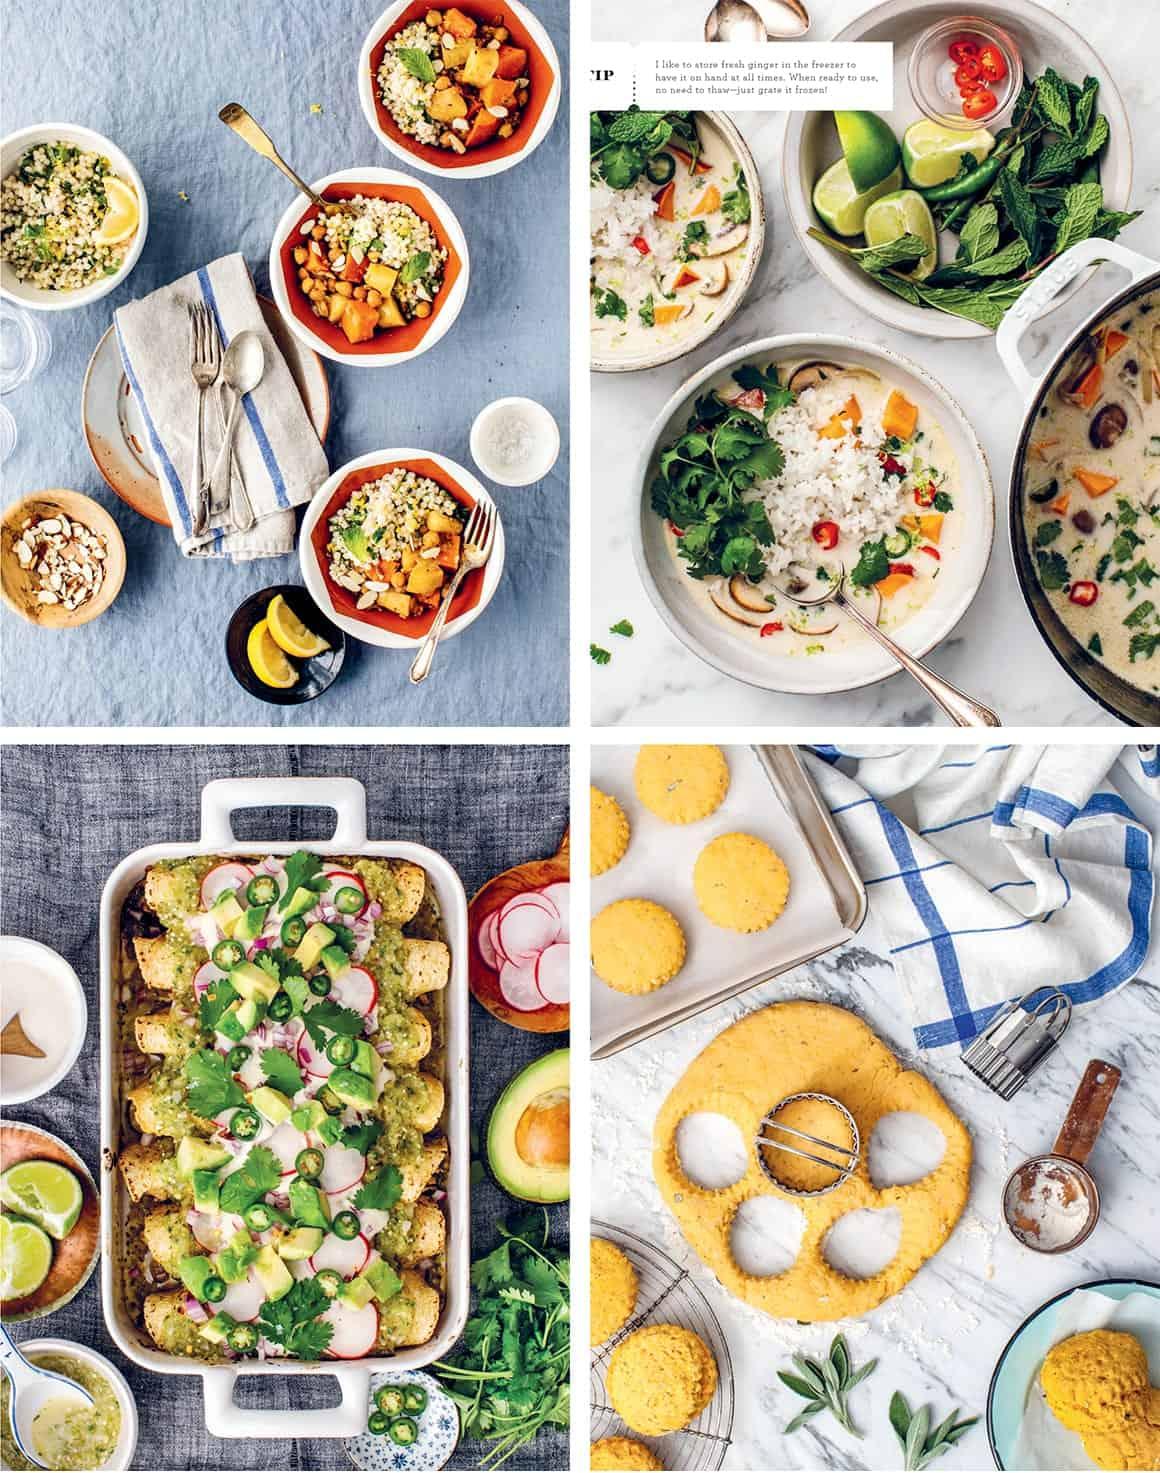 Love & Lemons Every Day - my new cookbook!